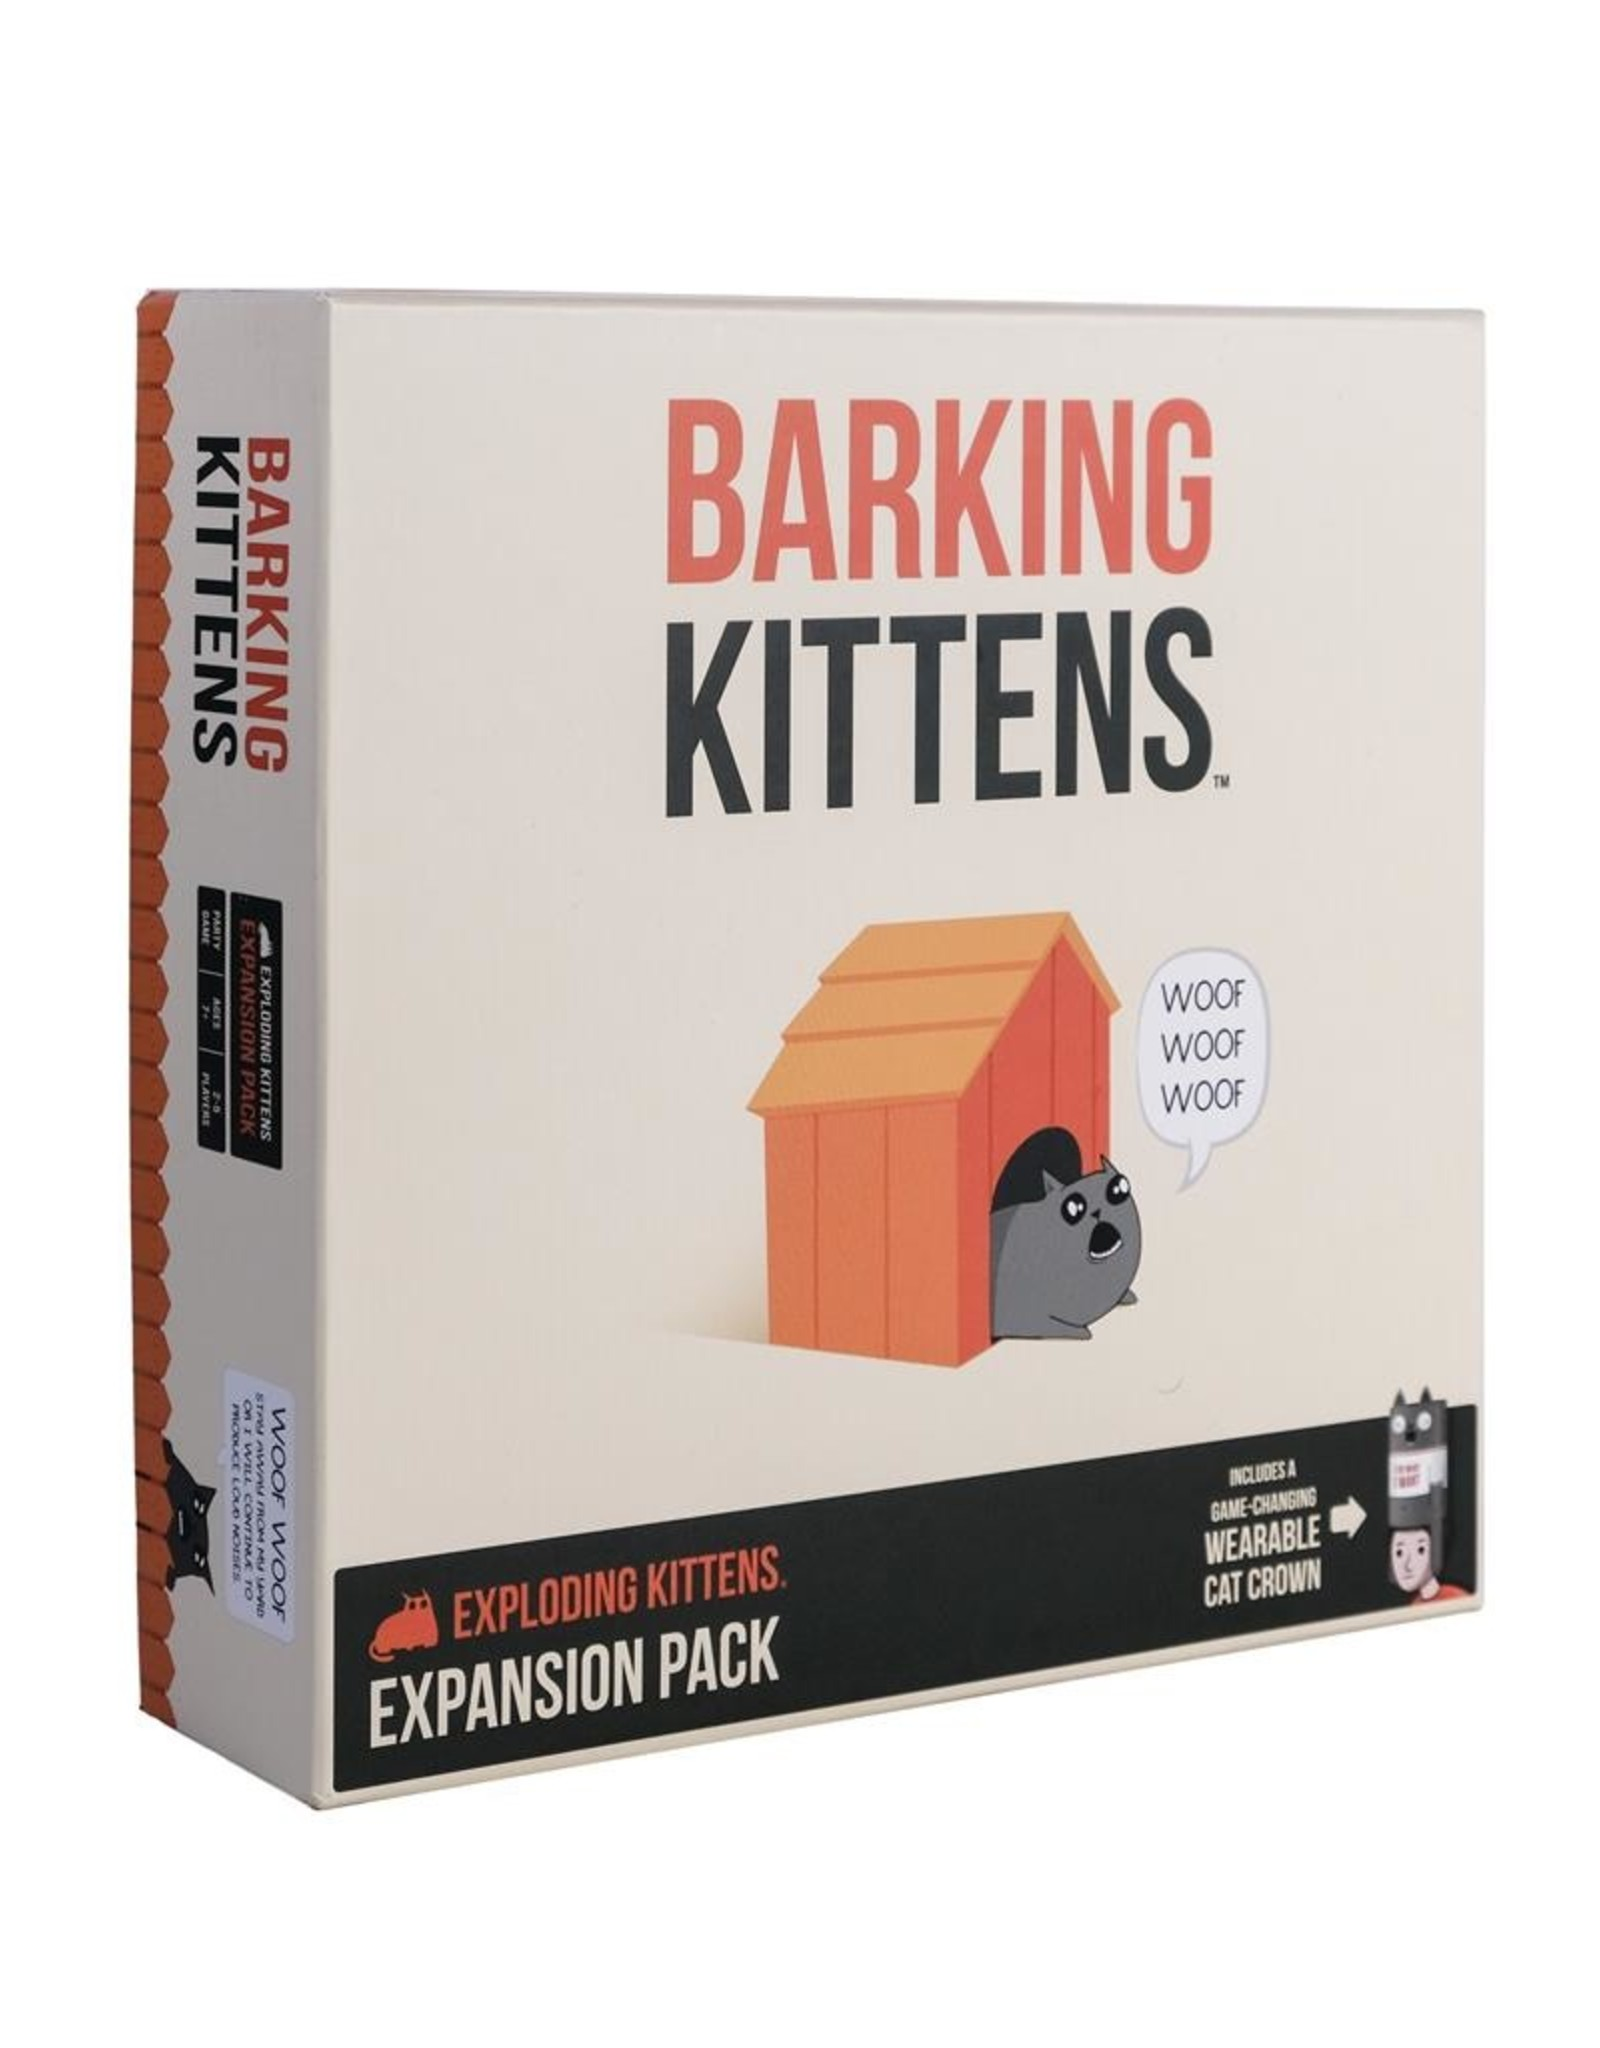 Exploding Kittens Exploding Kittens - Barking Kittens